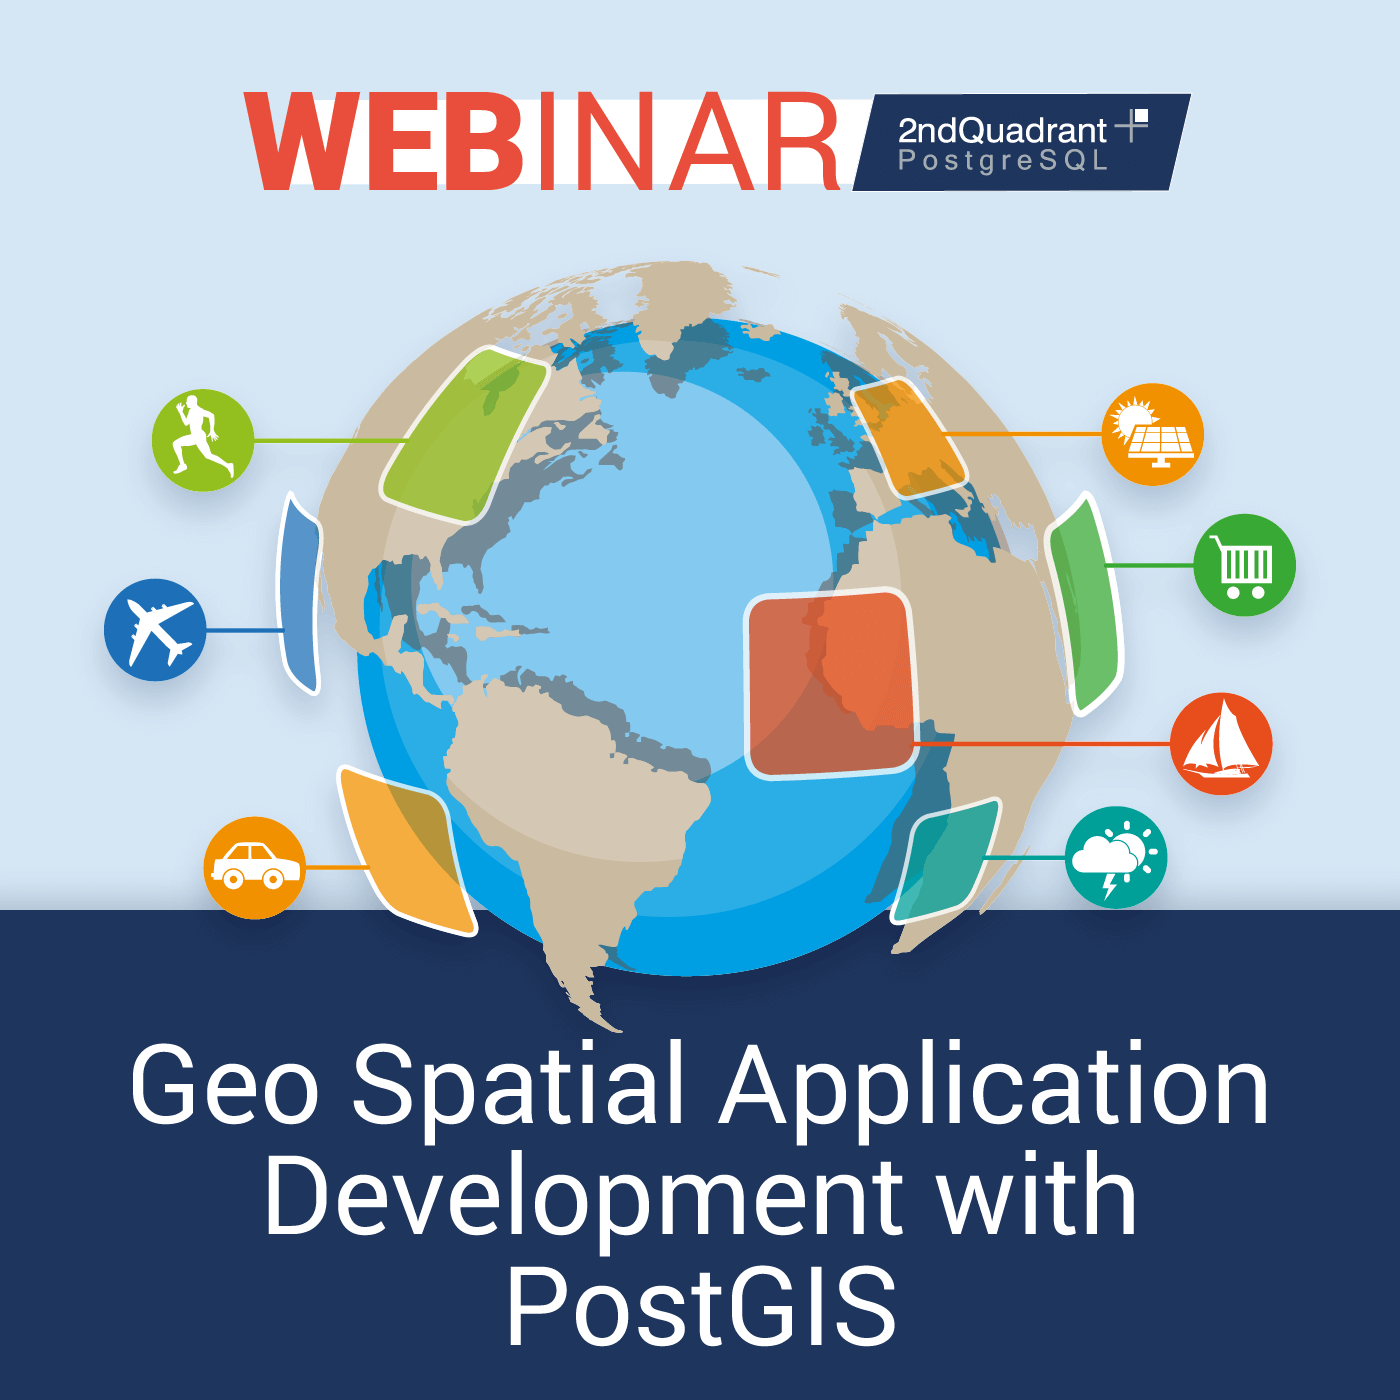 Geo Spatial Application Development with PostGIS